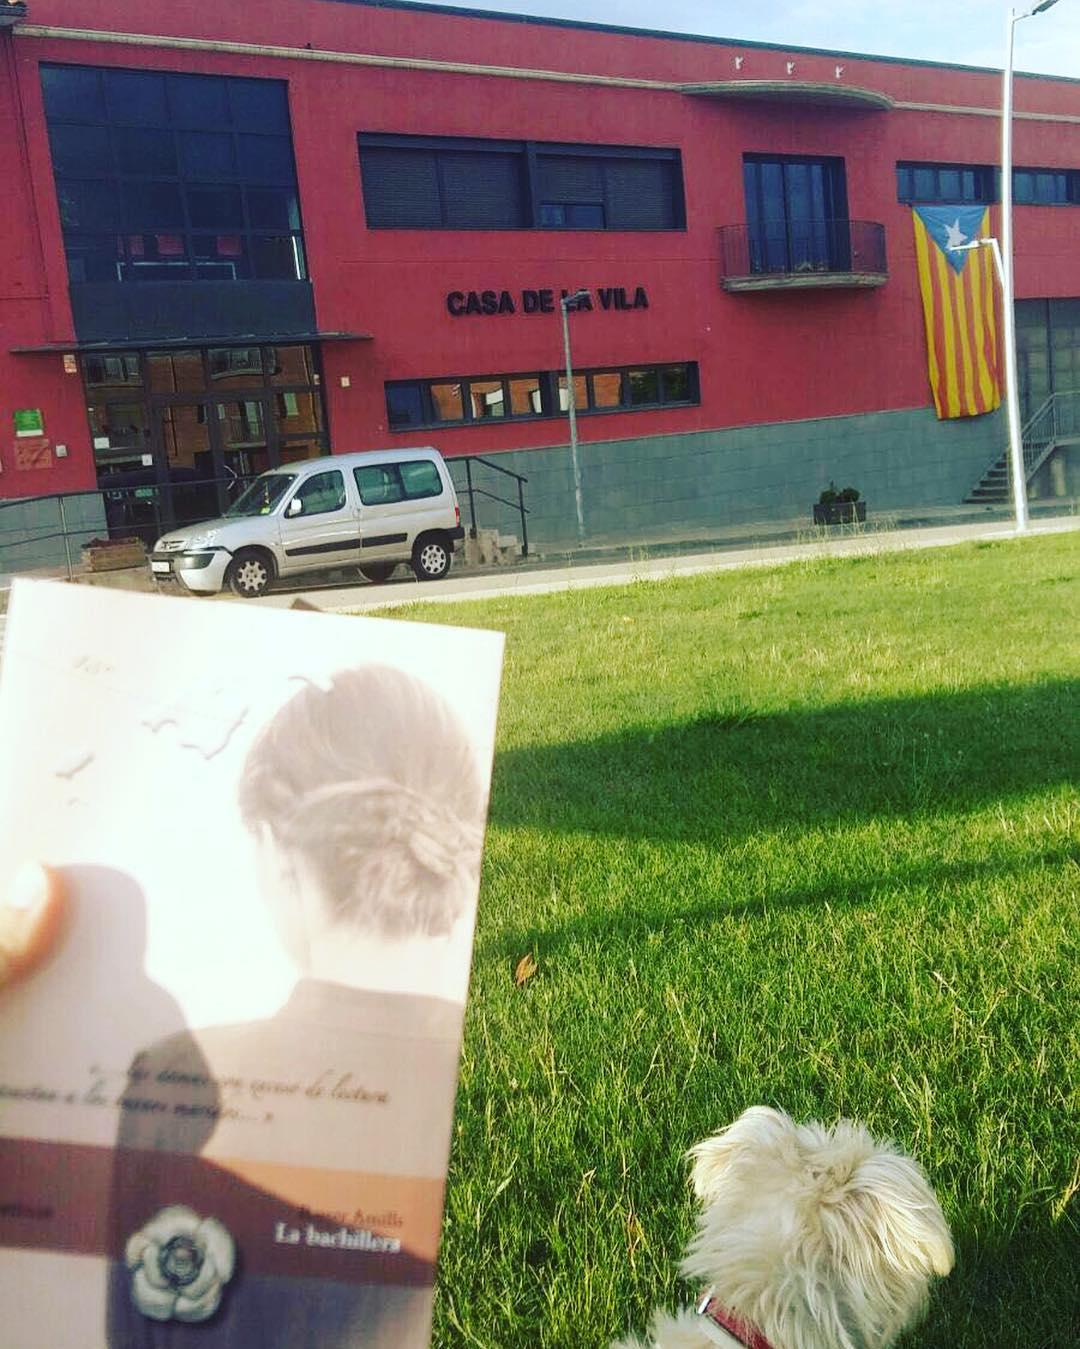 Los nuevos lectores de #labachillera me ponen las pilas: sigo escribiendo la próxima!! #mallorca @ifbeditors !!! #mallorquina #algaida #llibres #libro #books #bookshop #libreria #llibreria #bestseller #leermola #leeressexy #lecturas #booklover #bookstagram #cultura #regalalibros #regalallibres #novela #sigloXIX #sigloXVIII